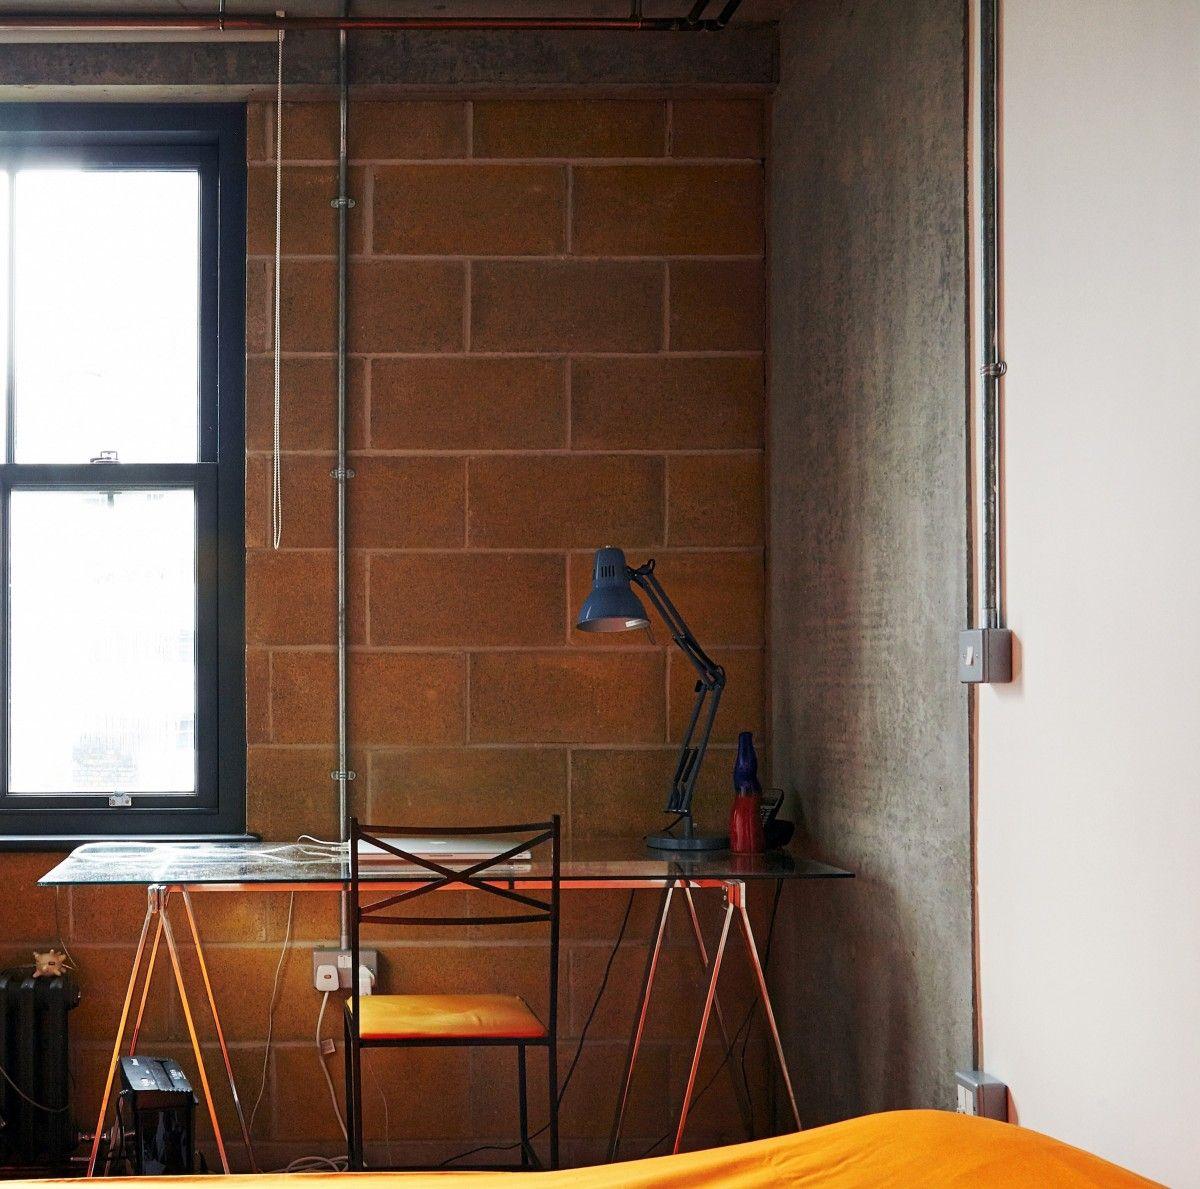 Two Bedroom Apartments London: Conduit Ec2a - London Apartments - 219